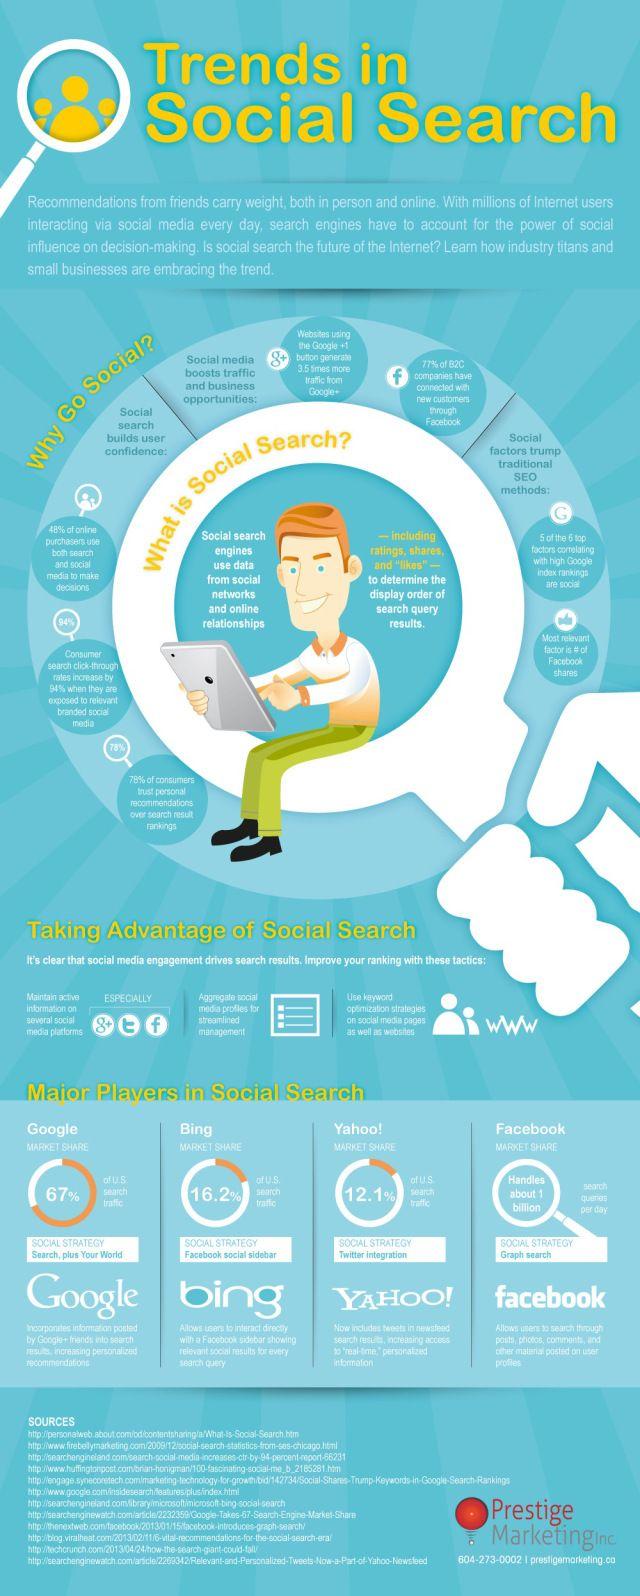 Trends in Social Search #infografia #infographic #socialmedia